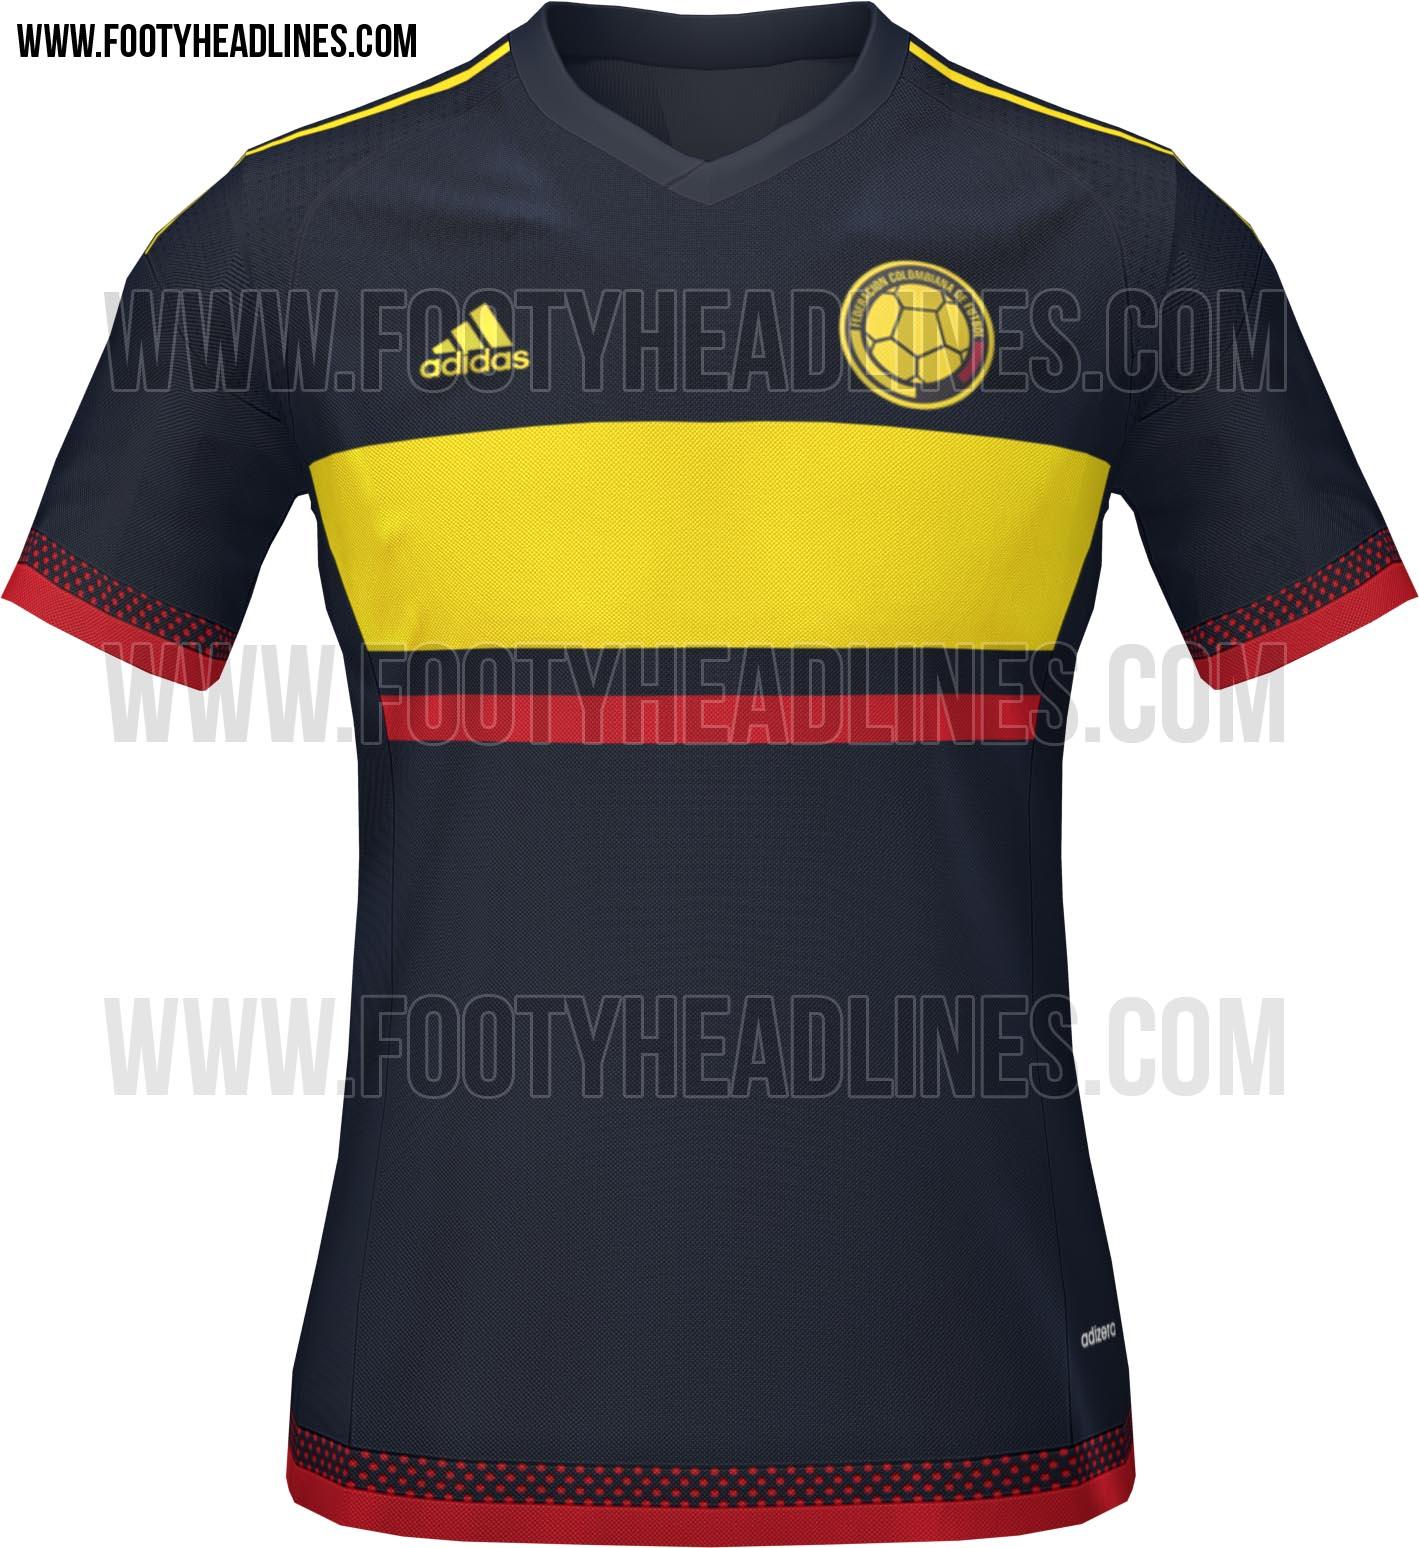 Colombia 2015 copa am rica kits revealed footy headlines for Cuarto kit del america